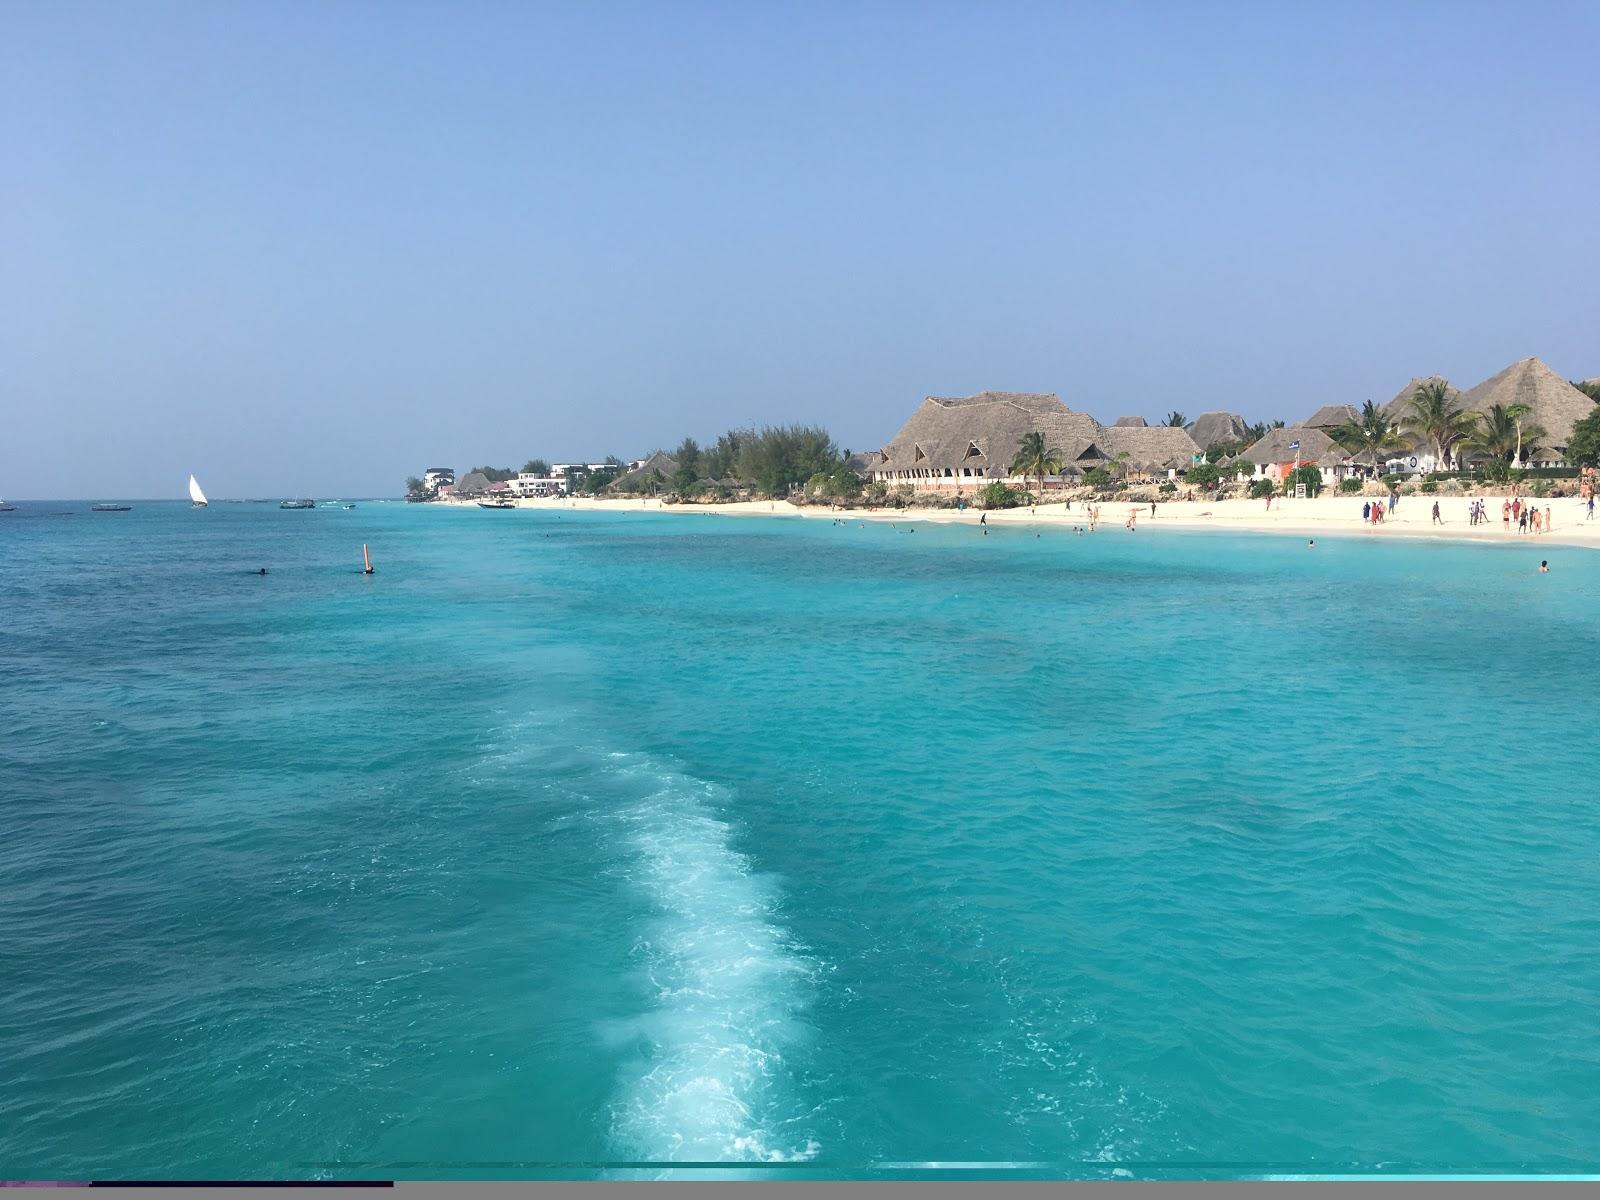 Pohľad z lode na pláž Kendwa, Zanzibar